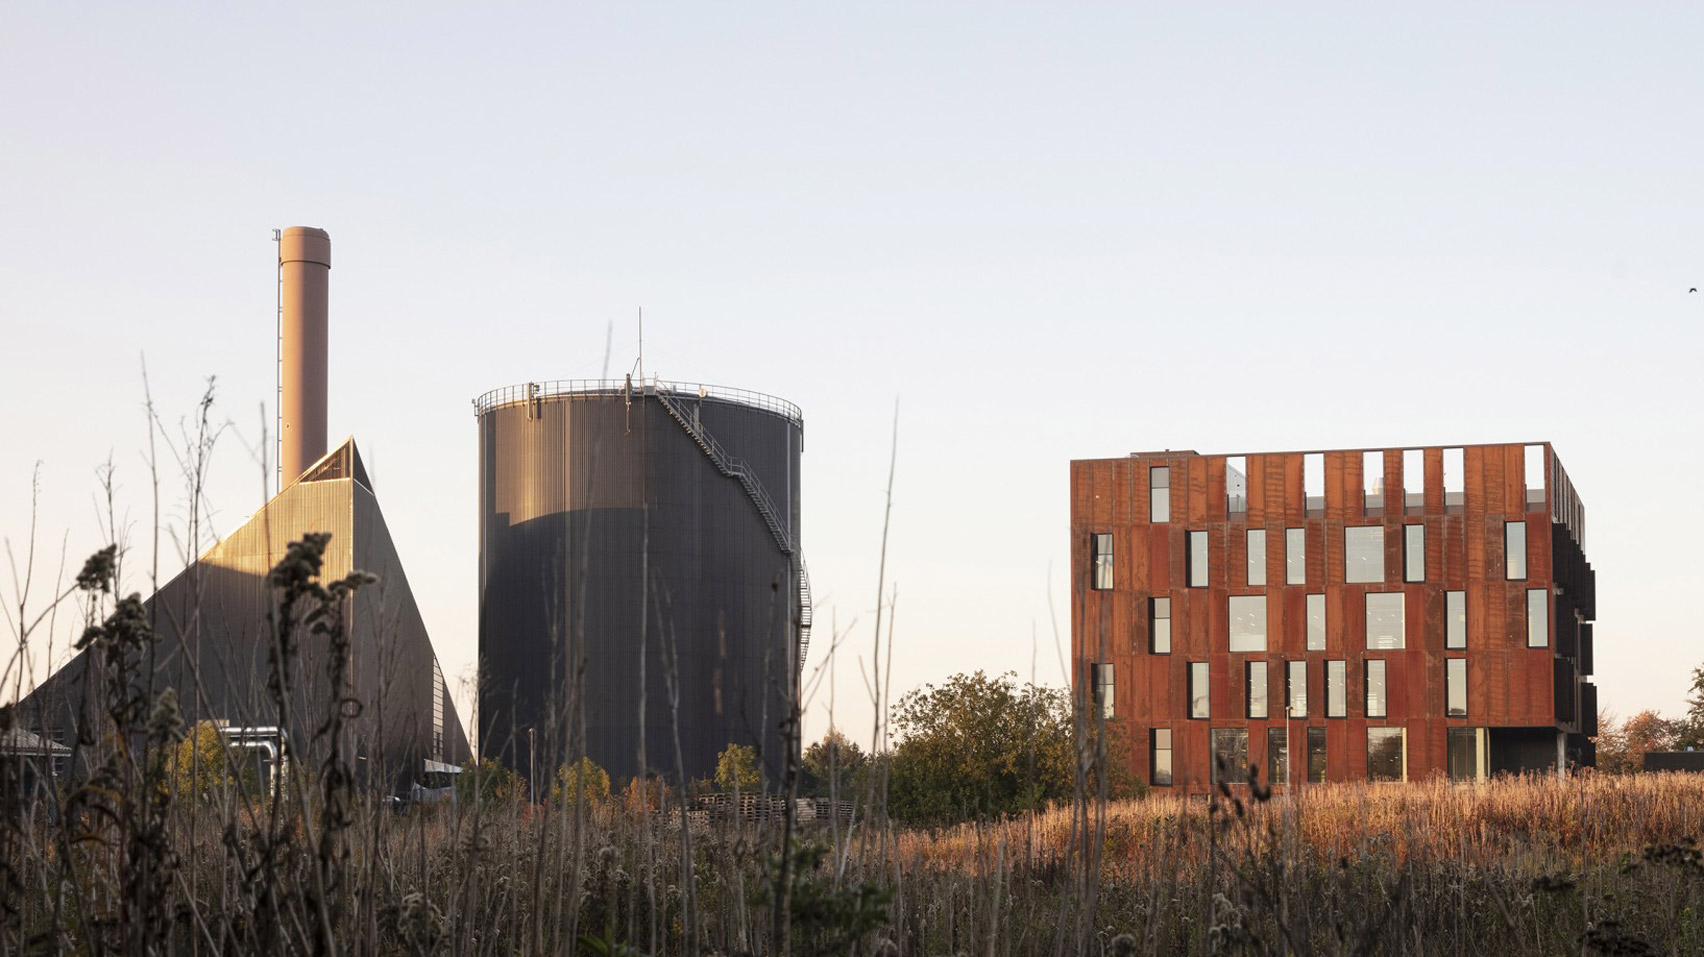 Forsyning Helsingør Operations Centre by Christensen & Co